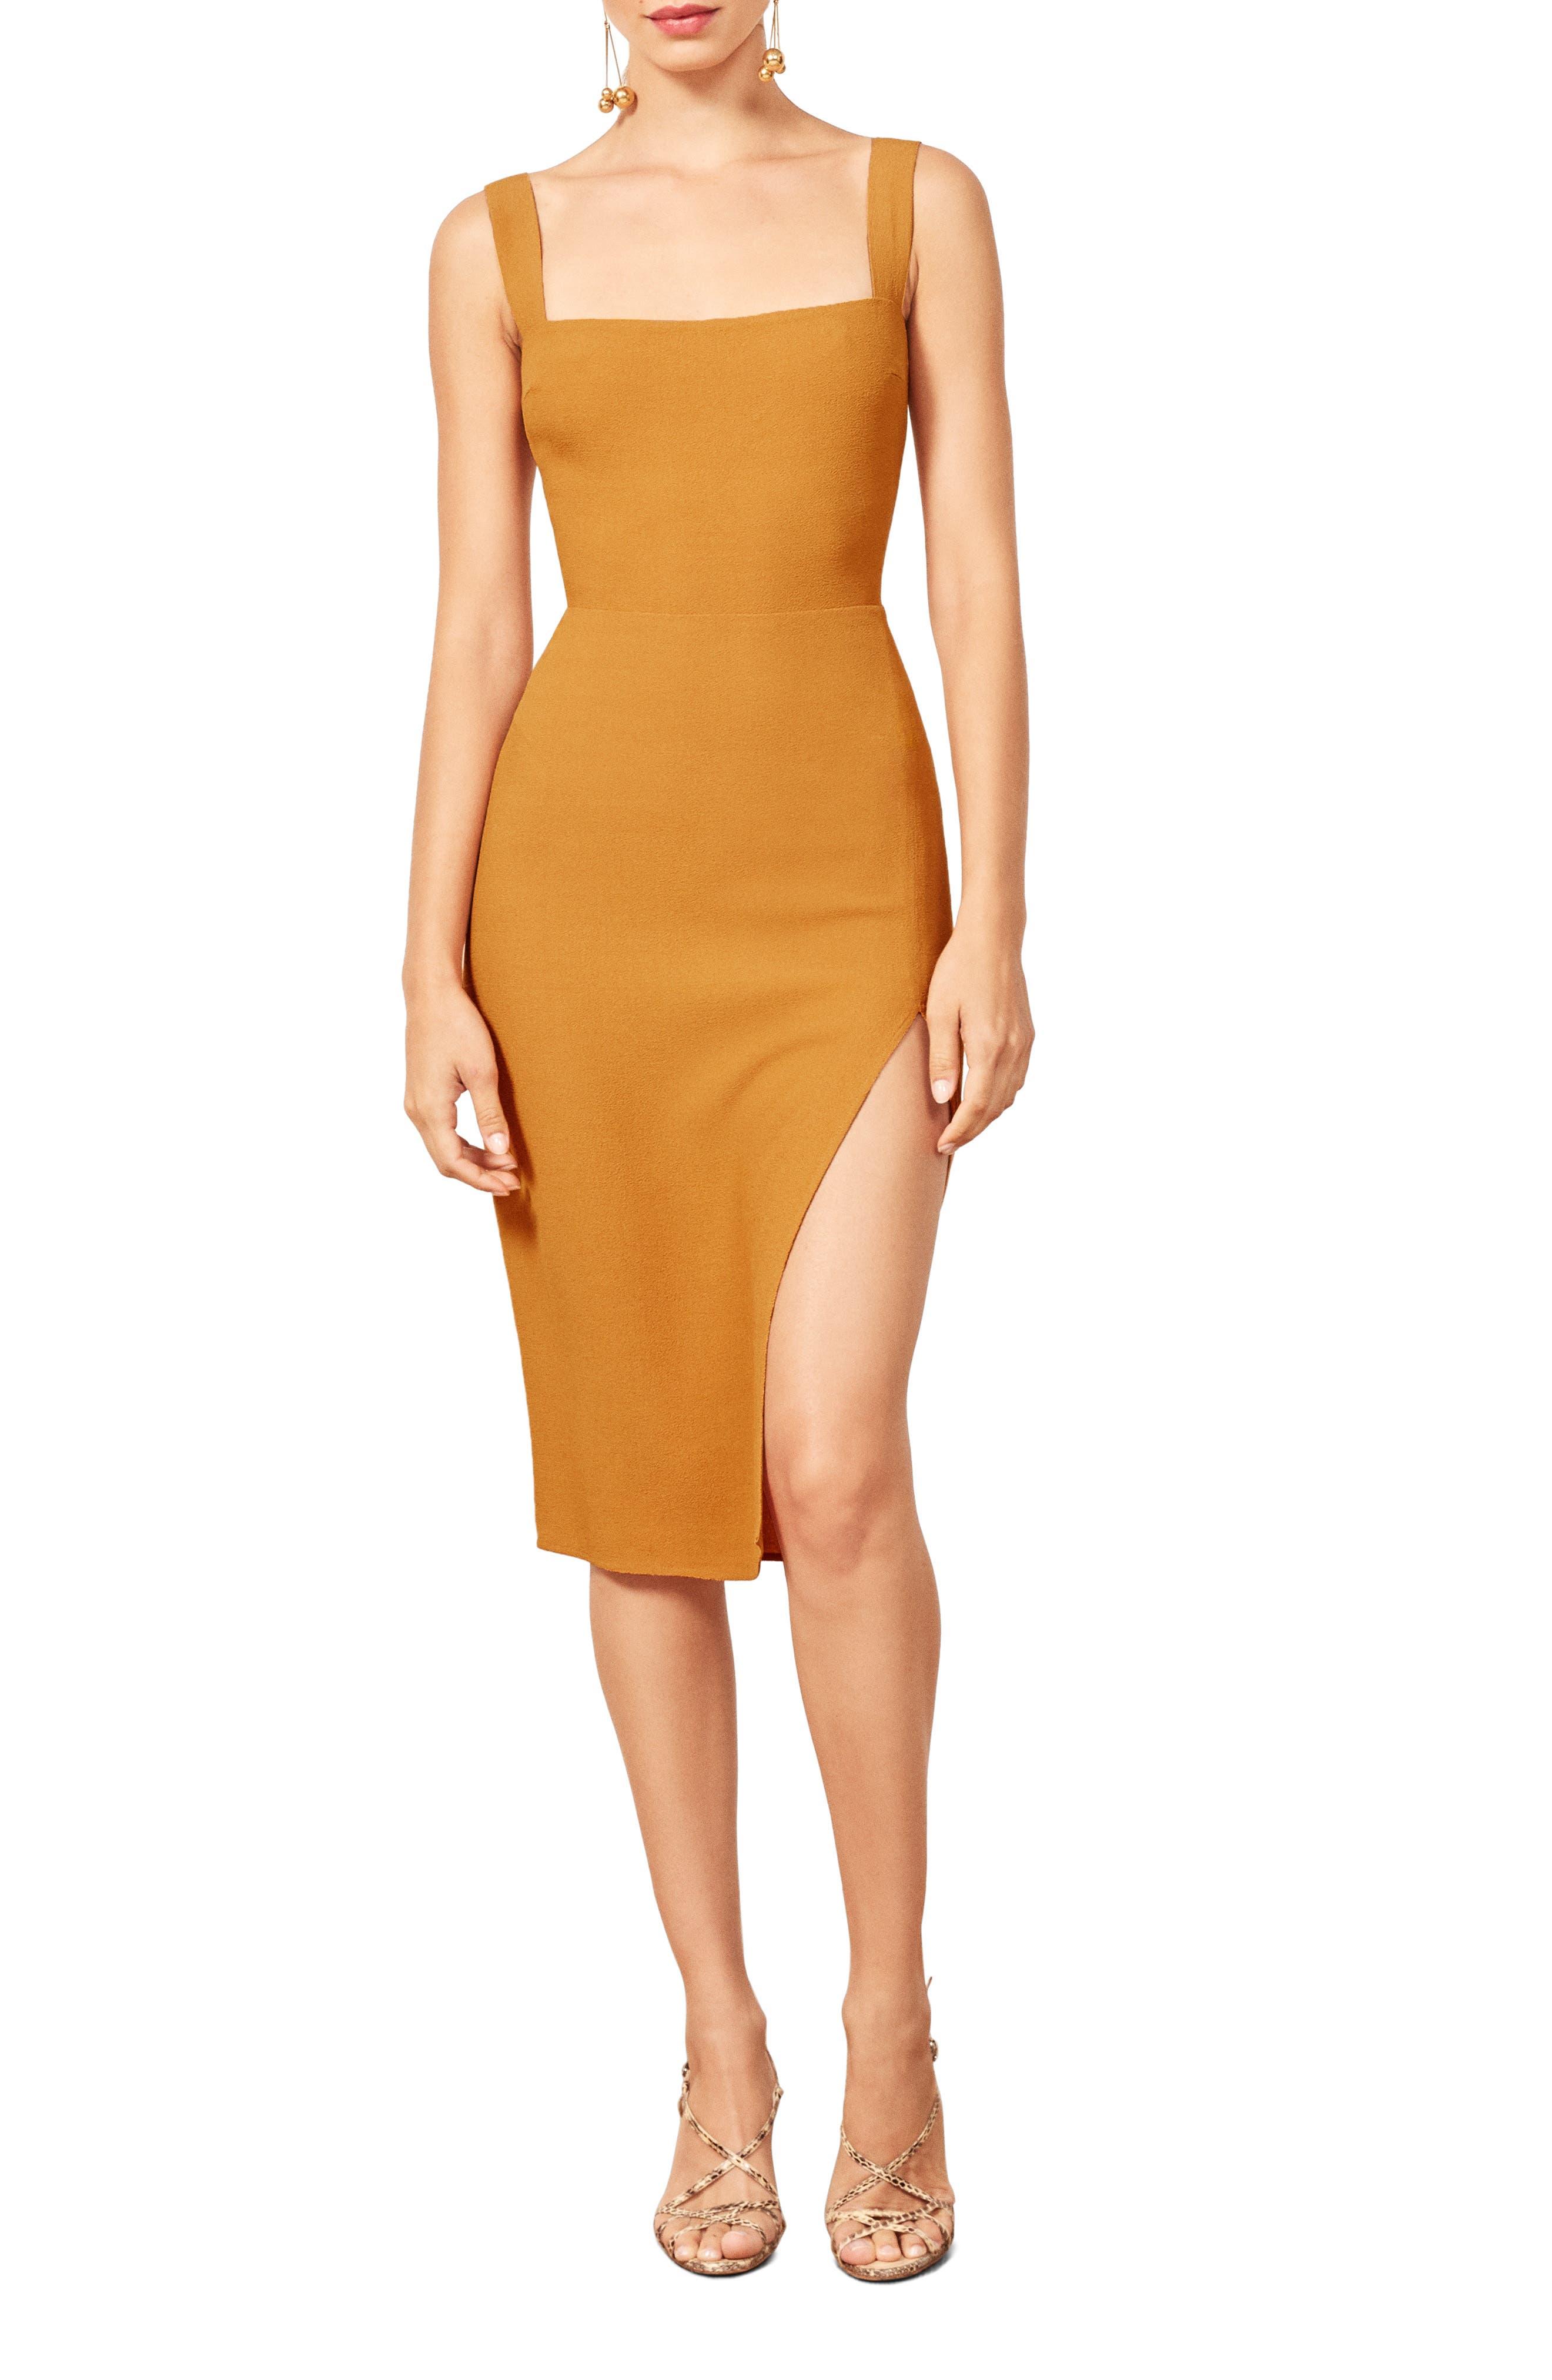 Reformation Christina Dress